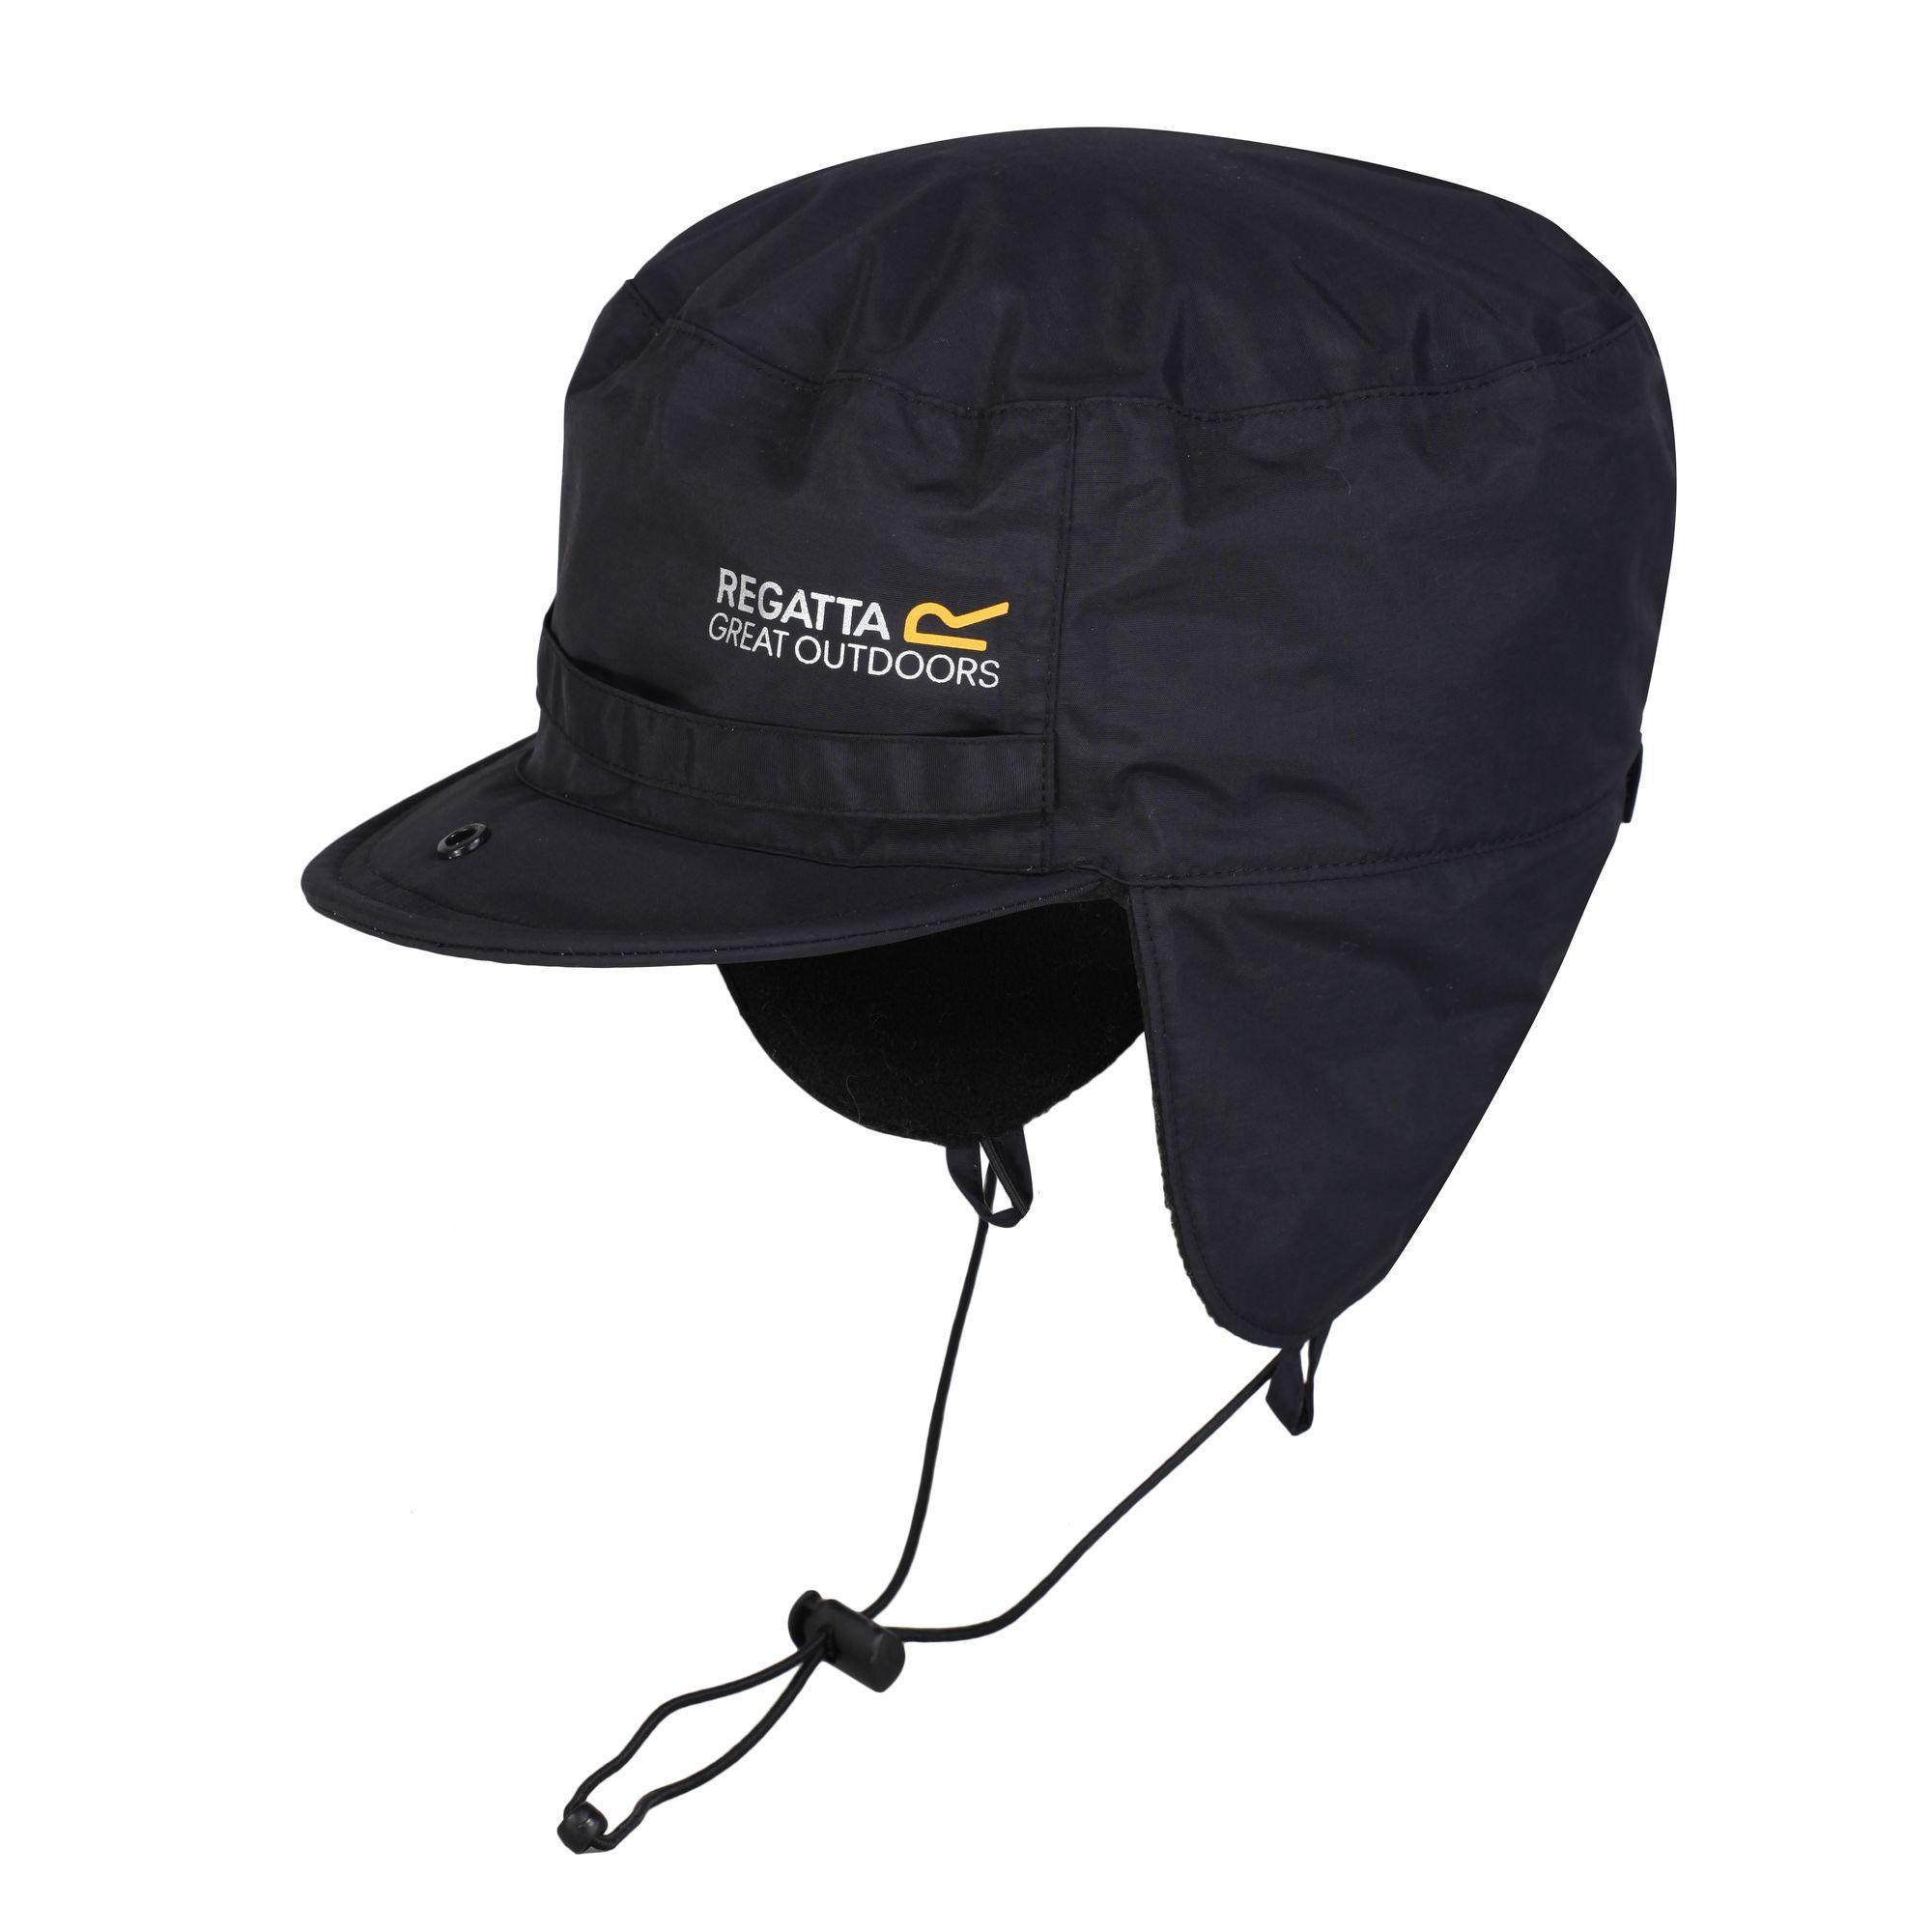 Regatta Great Outdoors Adults Unisex Padded Igniter Hat